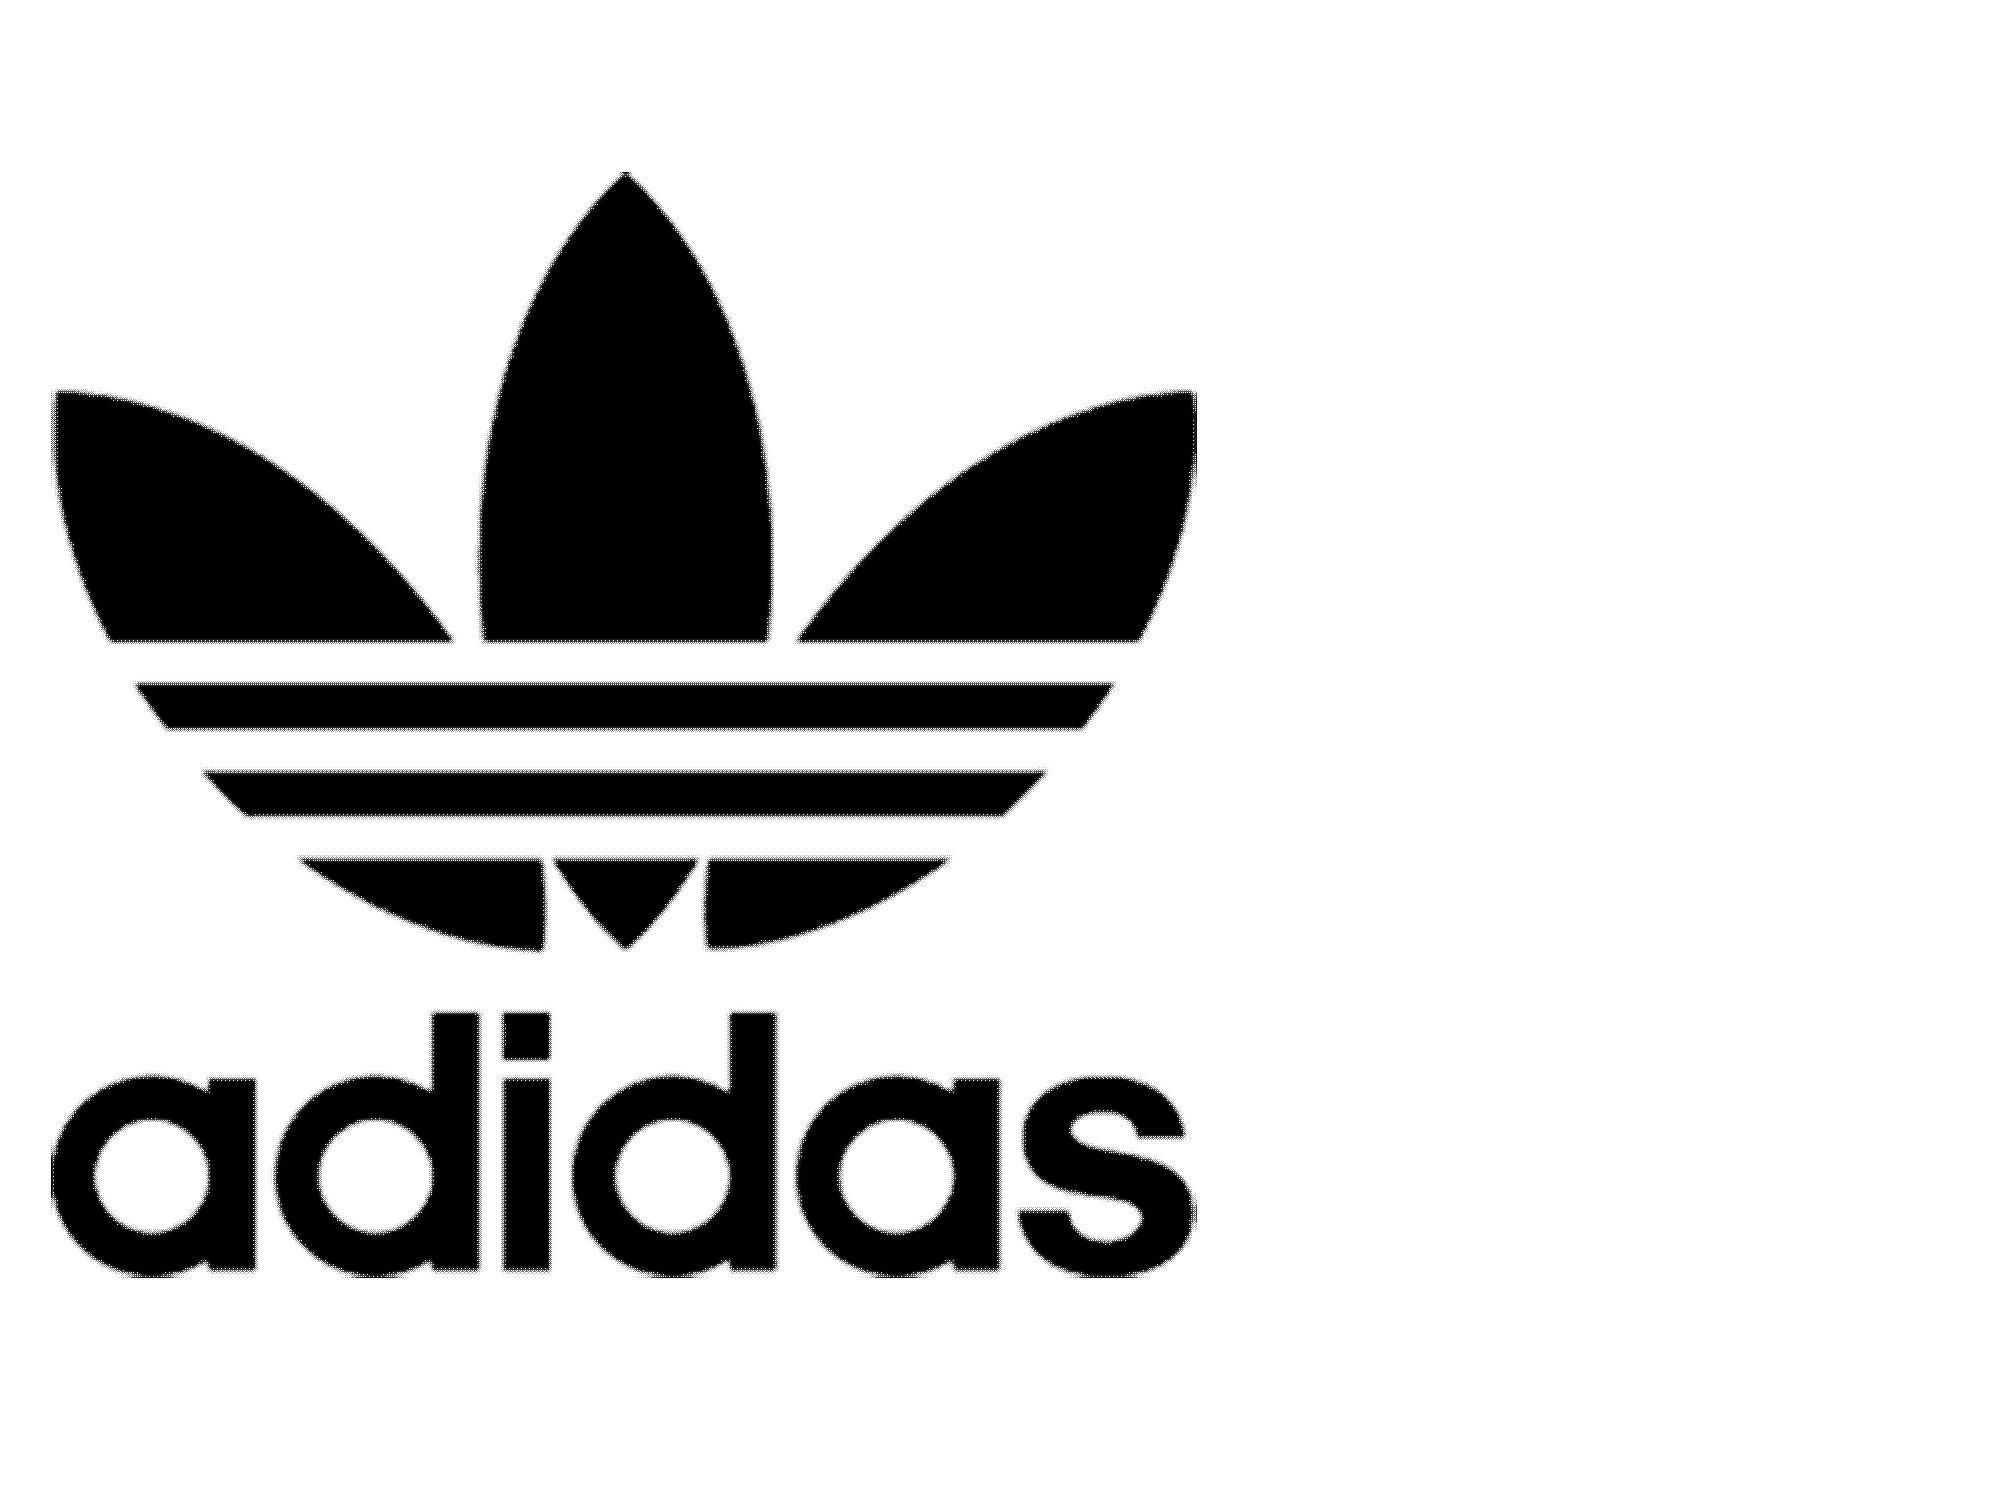 adidas originals png #2389